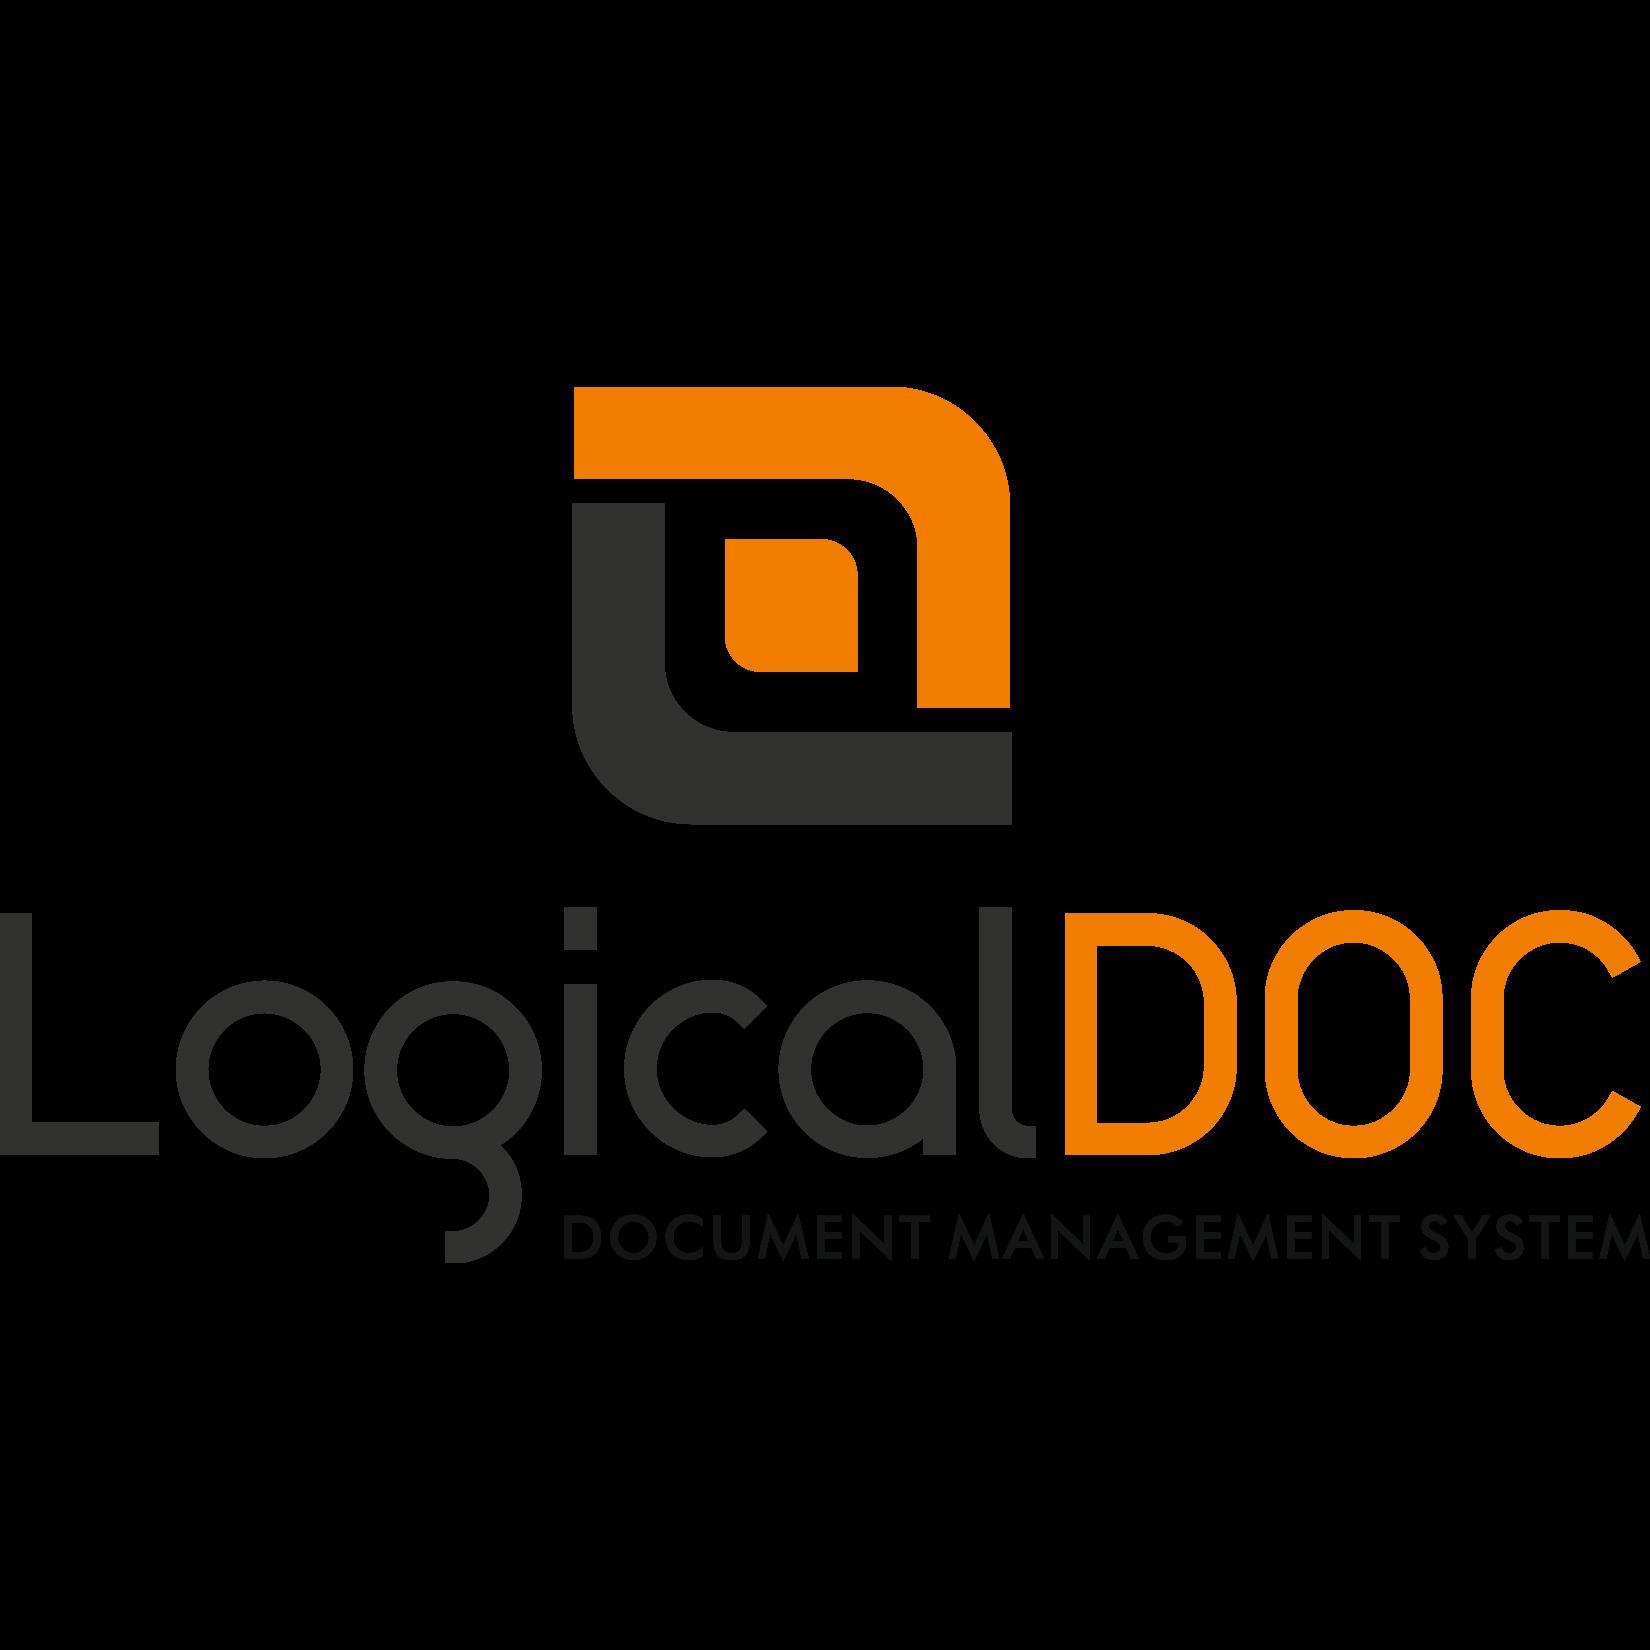 LogicalDoc Community Edition logo